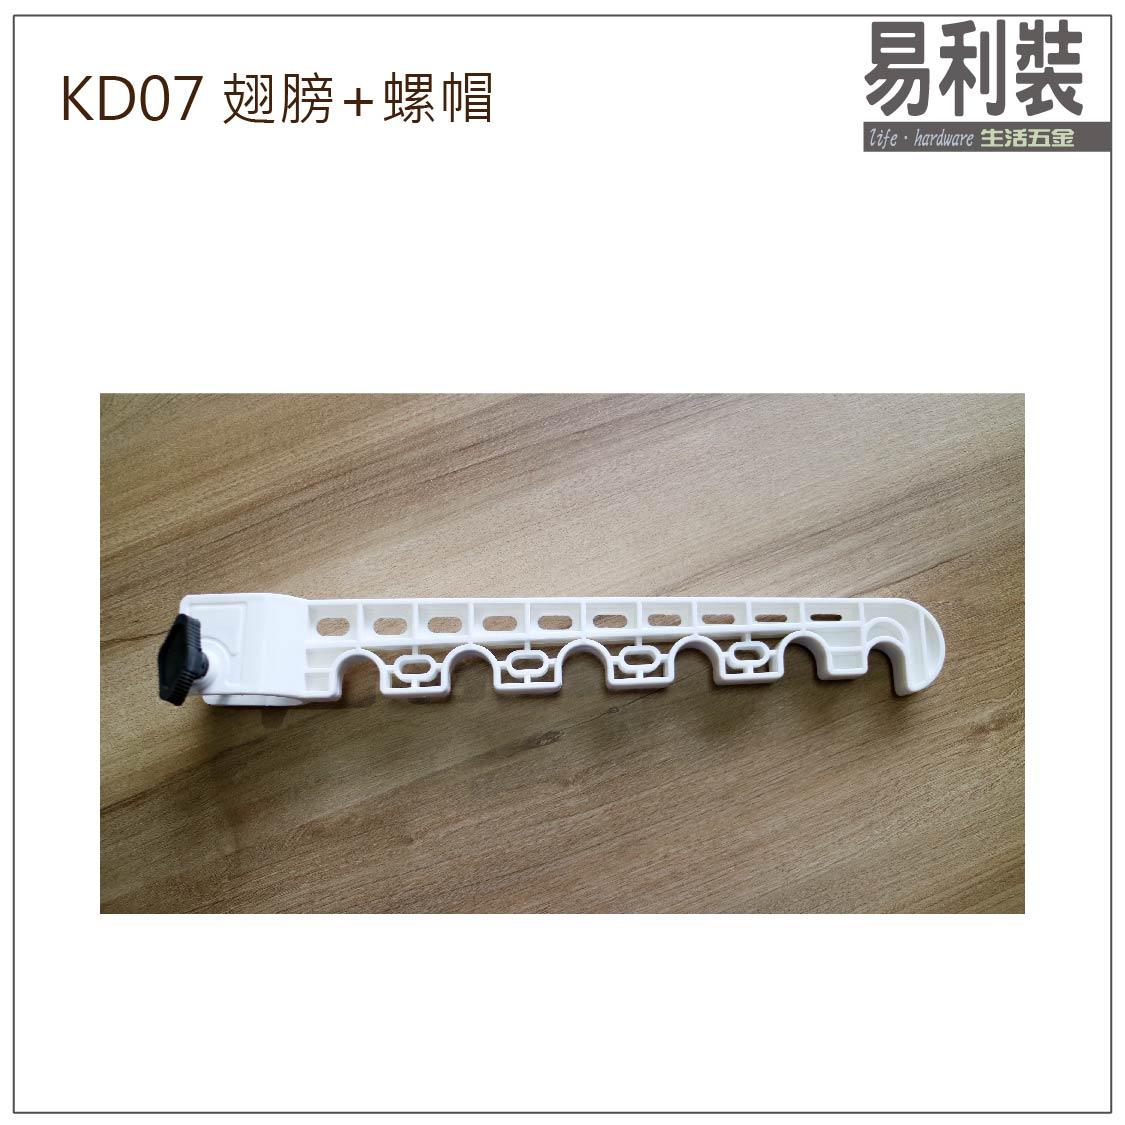 【 EASYCAN  】KD07 頂天立地組合配件 易利裝生活五金 翅膀